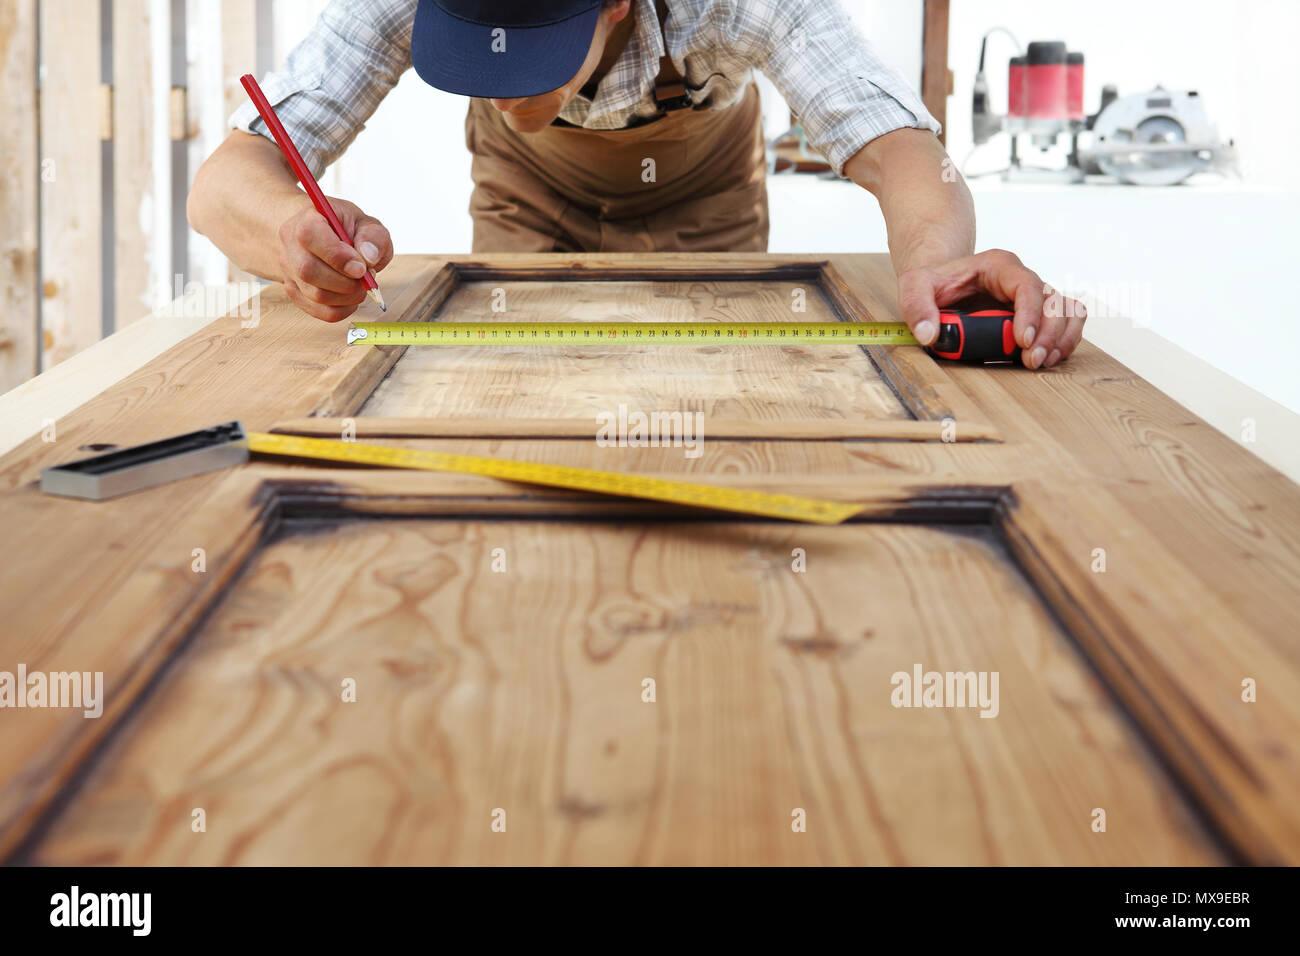 carpenter work the wood, measuring a wooden vintage door Stock Photo